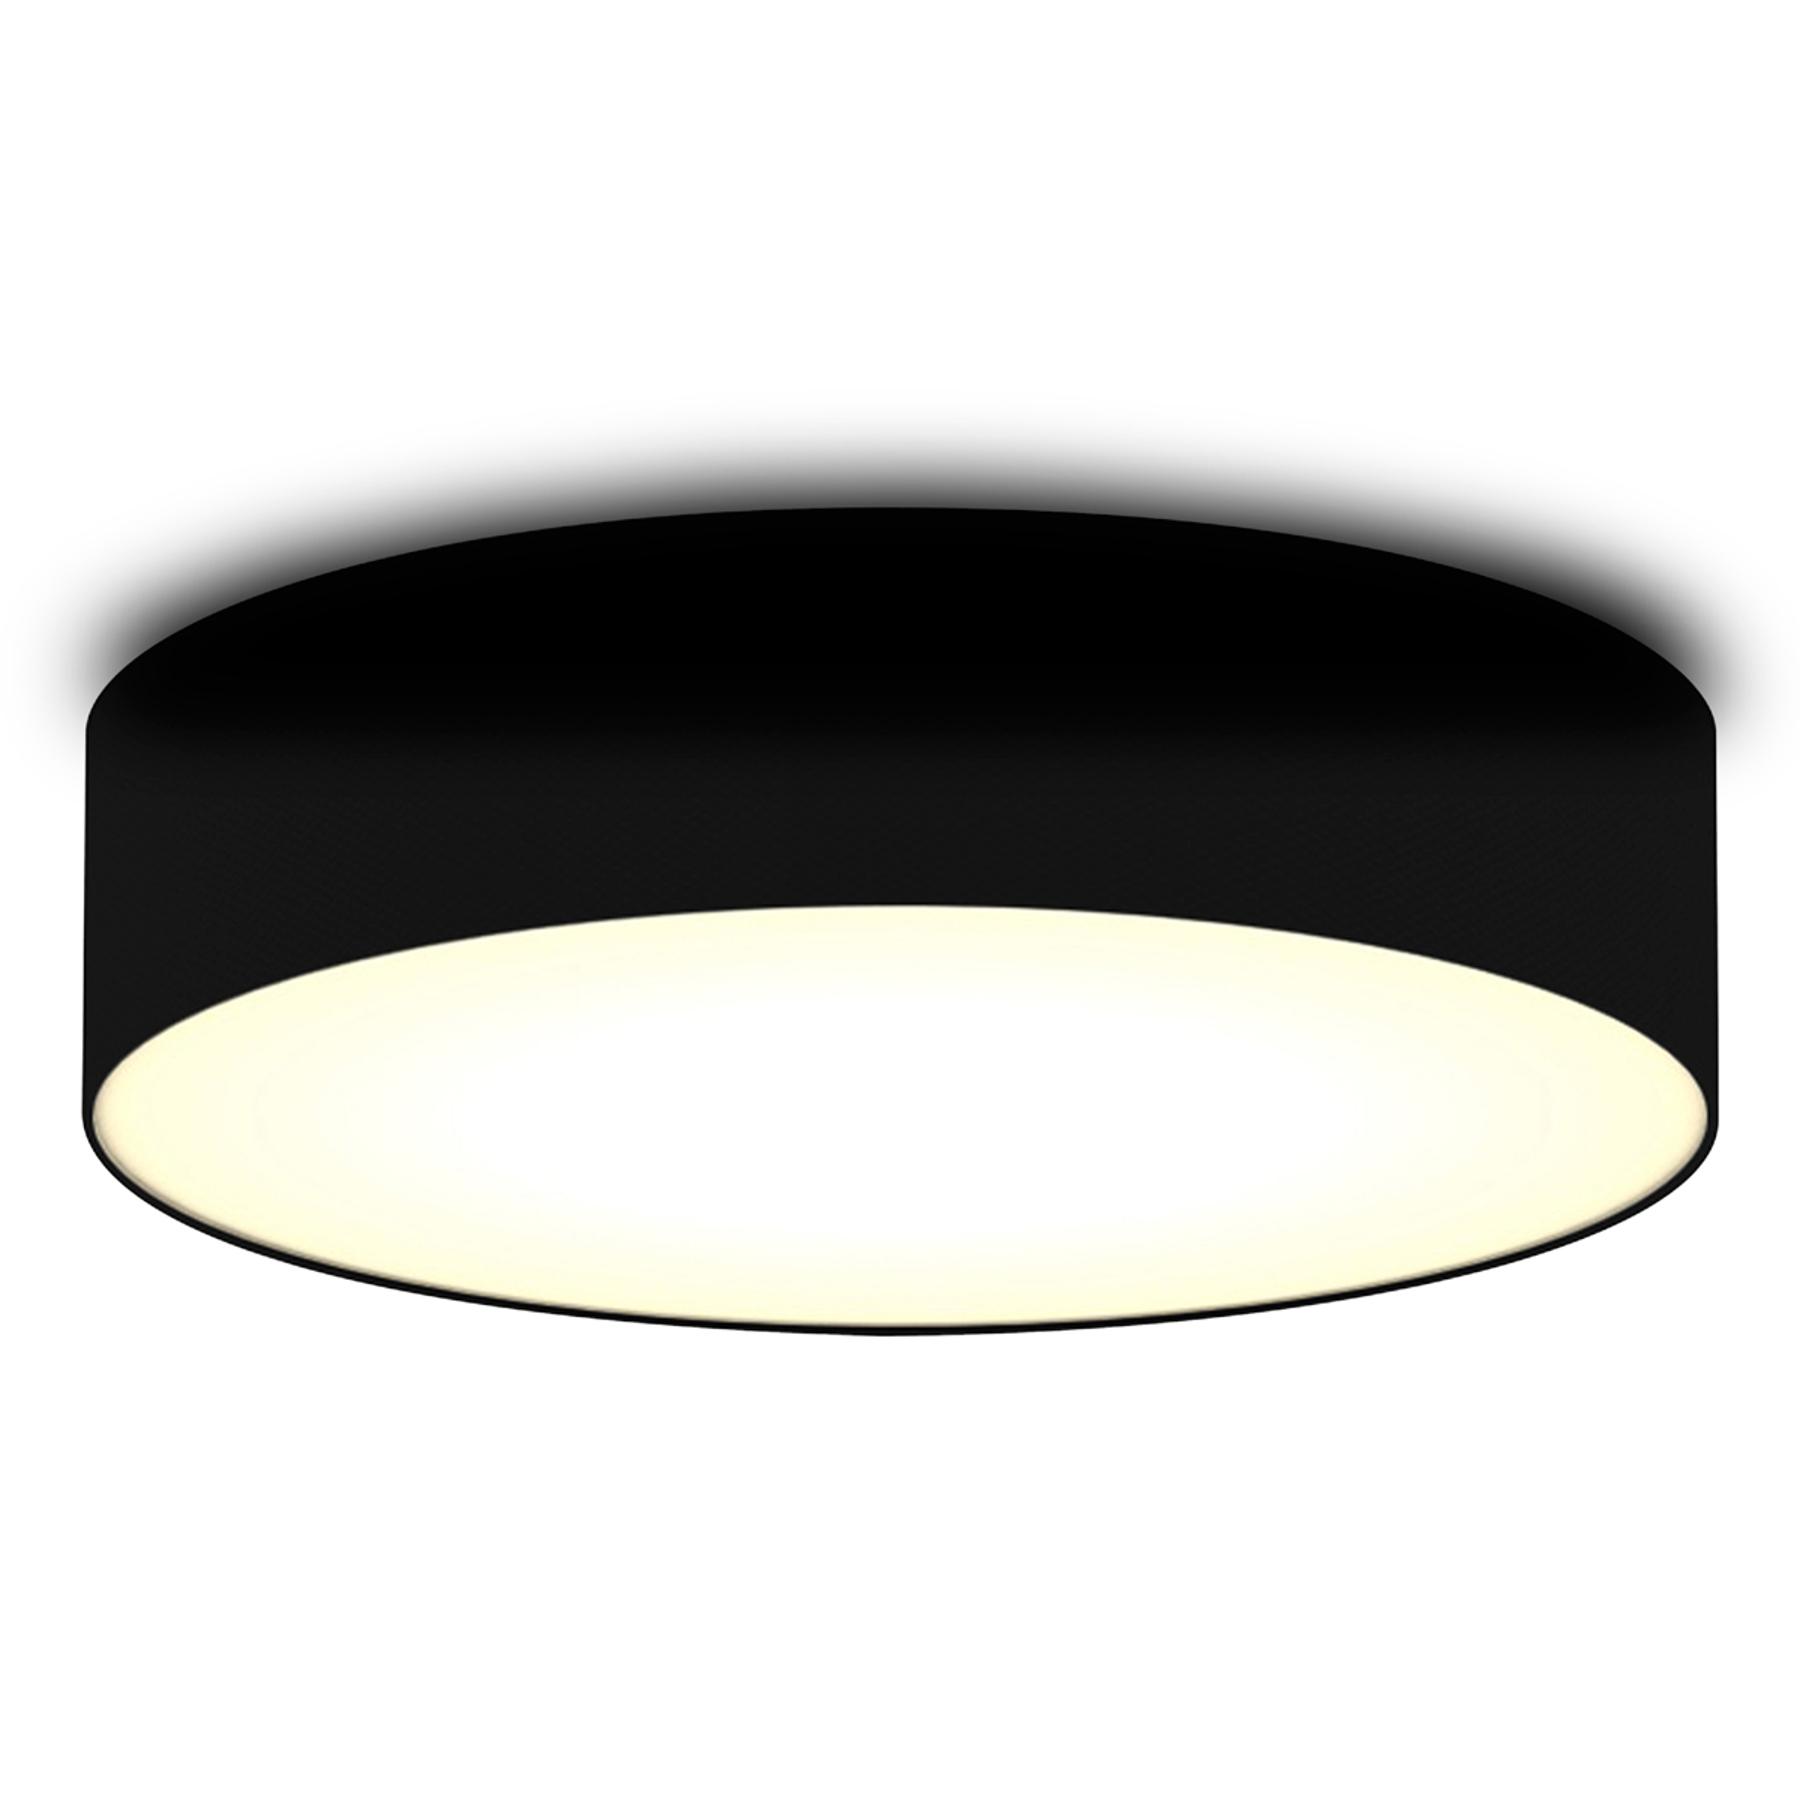 Czarna lampa sufitowa CEILING DREAM, 40 cm